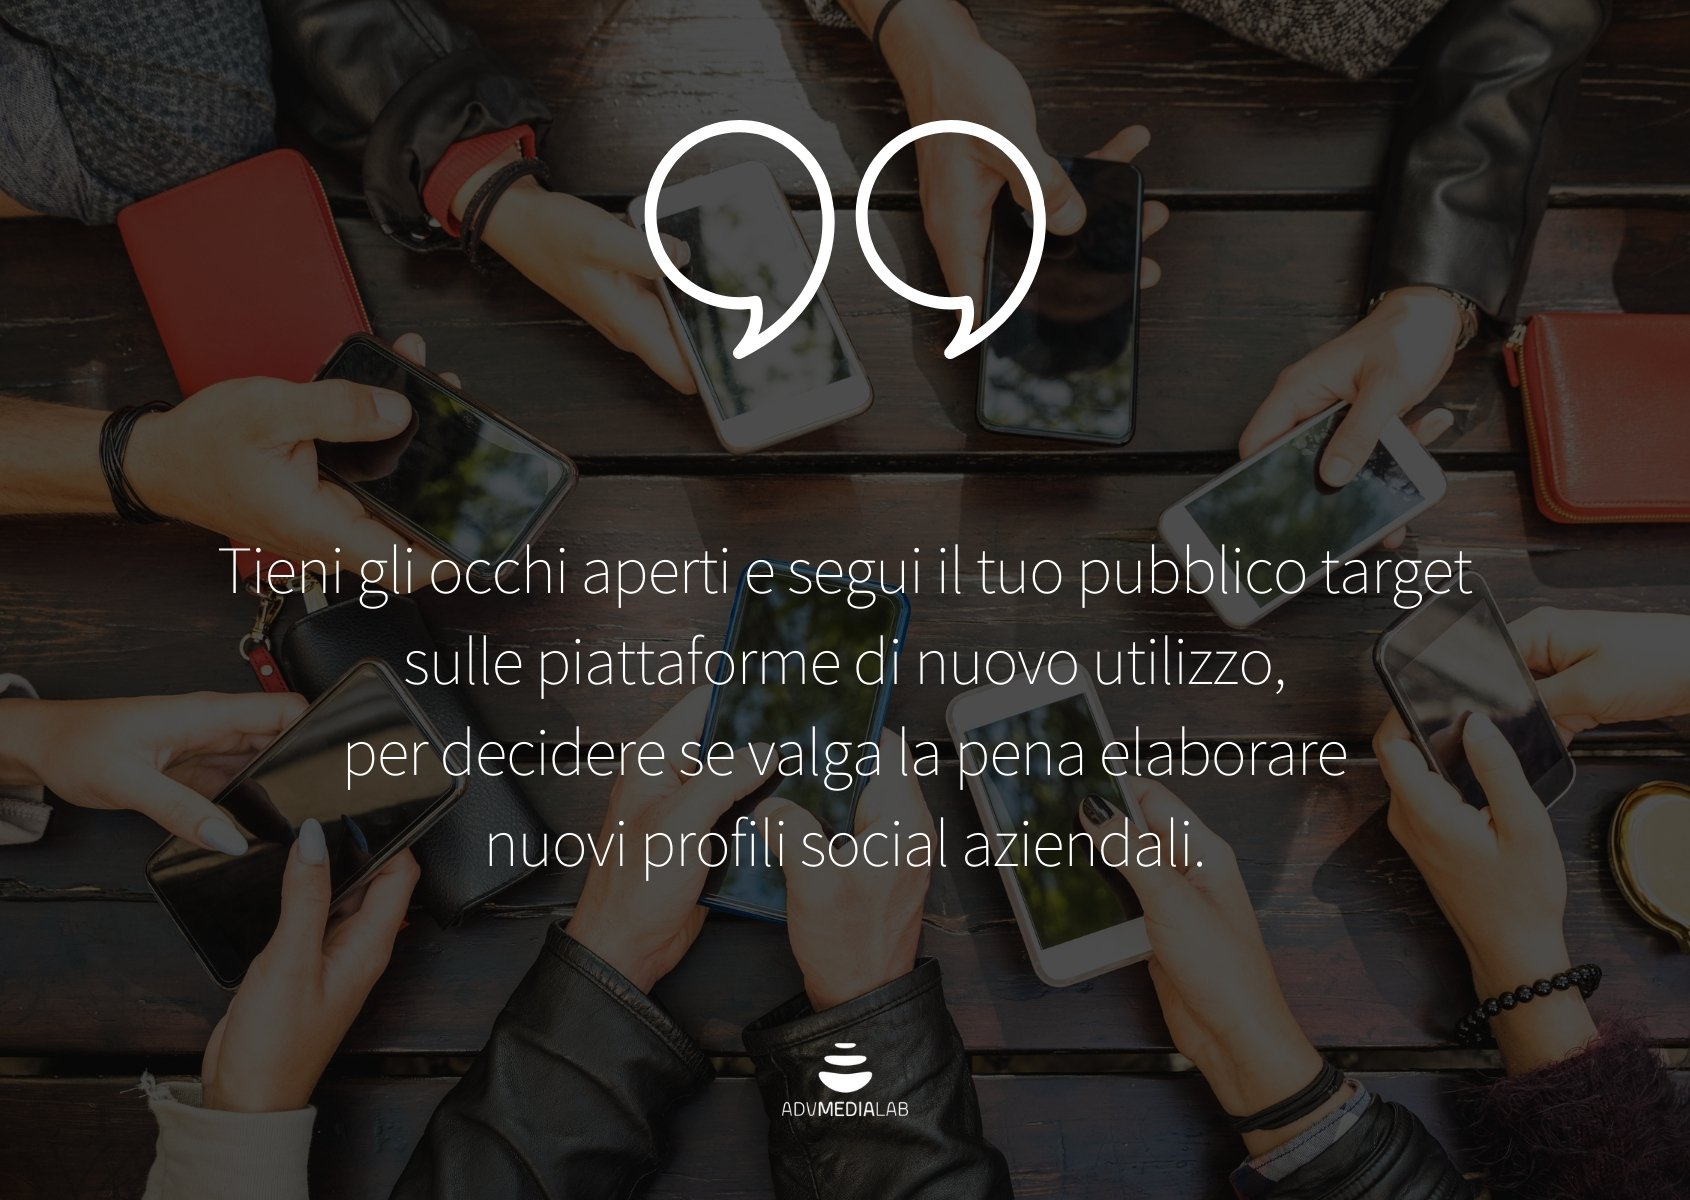 Blog-post-SOCIAL-MEDIA-CHECKLIST-2021-quote1